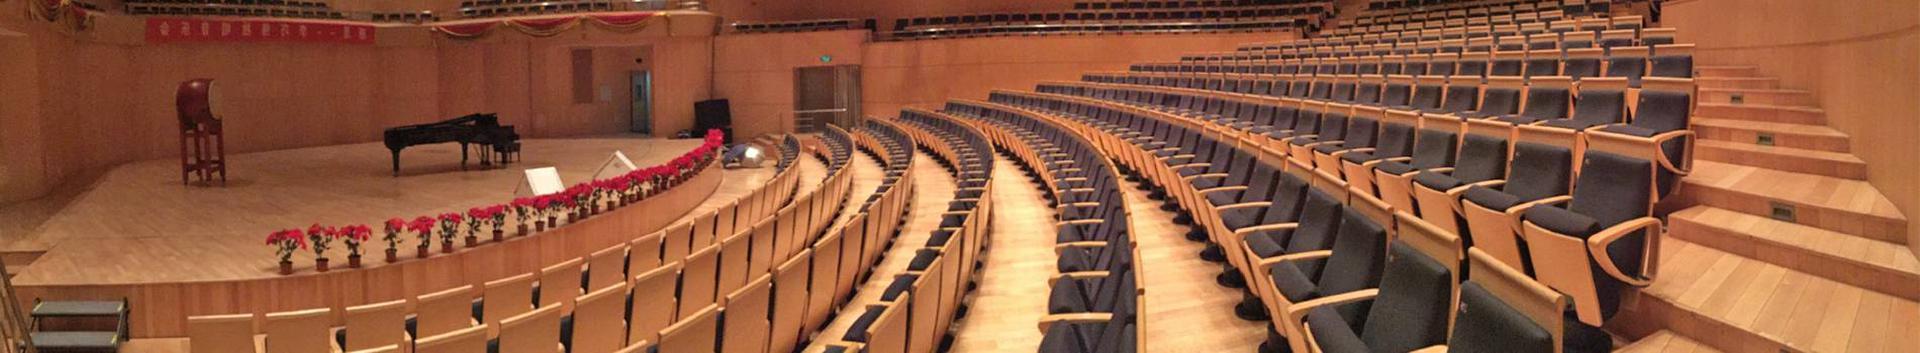 90041_teatri-jms-hoonete-kaitus_28634588_xl.jpg